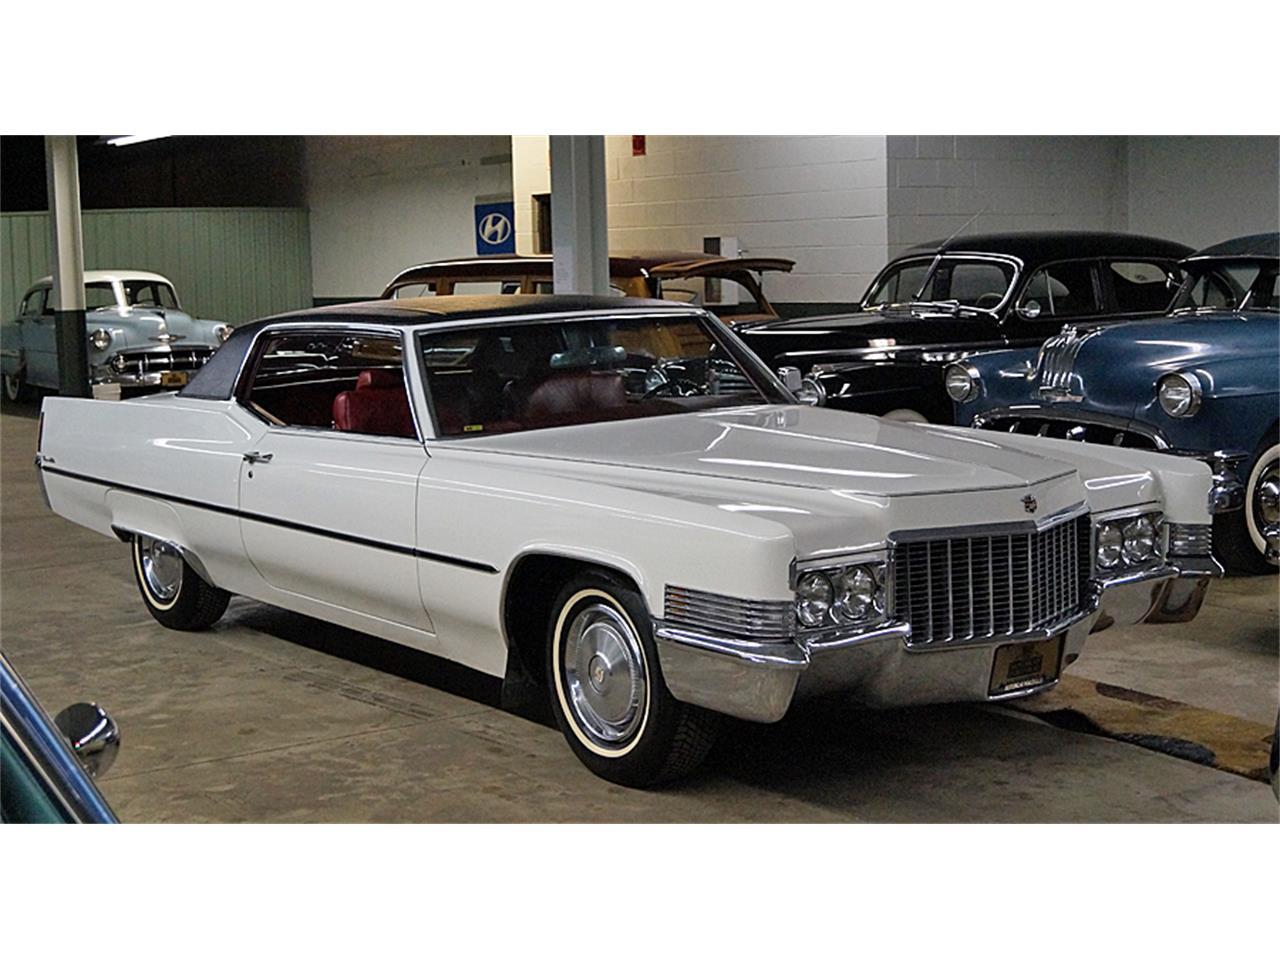 1970 Cadillac Coupe Deville For Sale Classiccars Com Cc 1094014